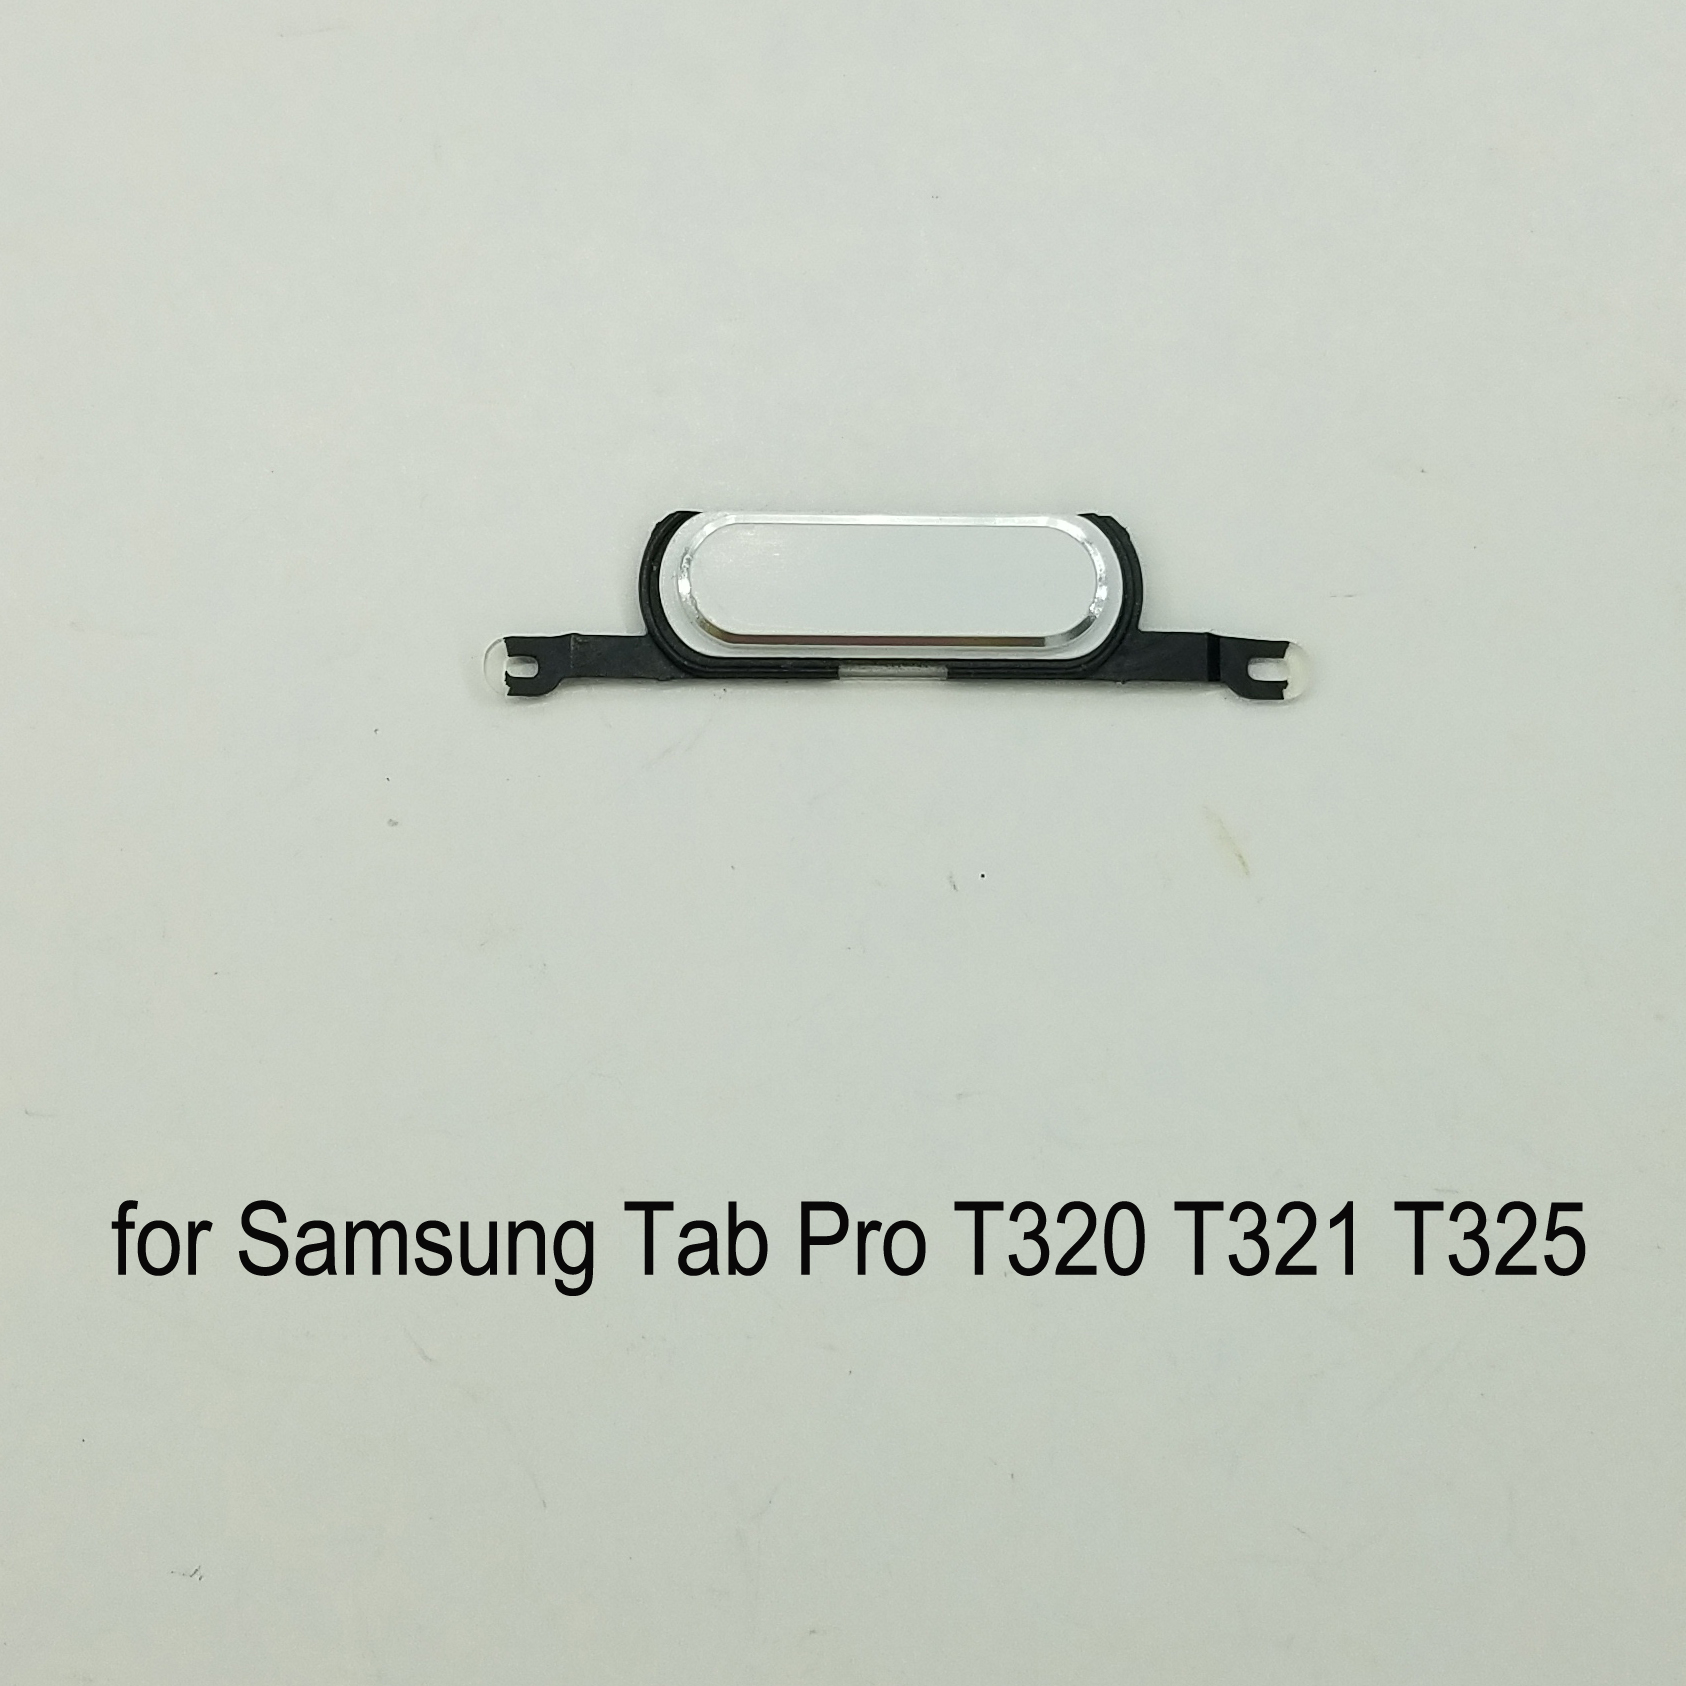 For Samsung Galaxy Tab Pro 8.4 T320 T321 T325 Original Tablet Phone Housing Frame New Home Button Menu Key Black White